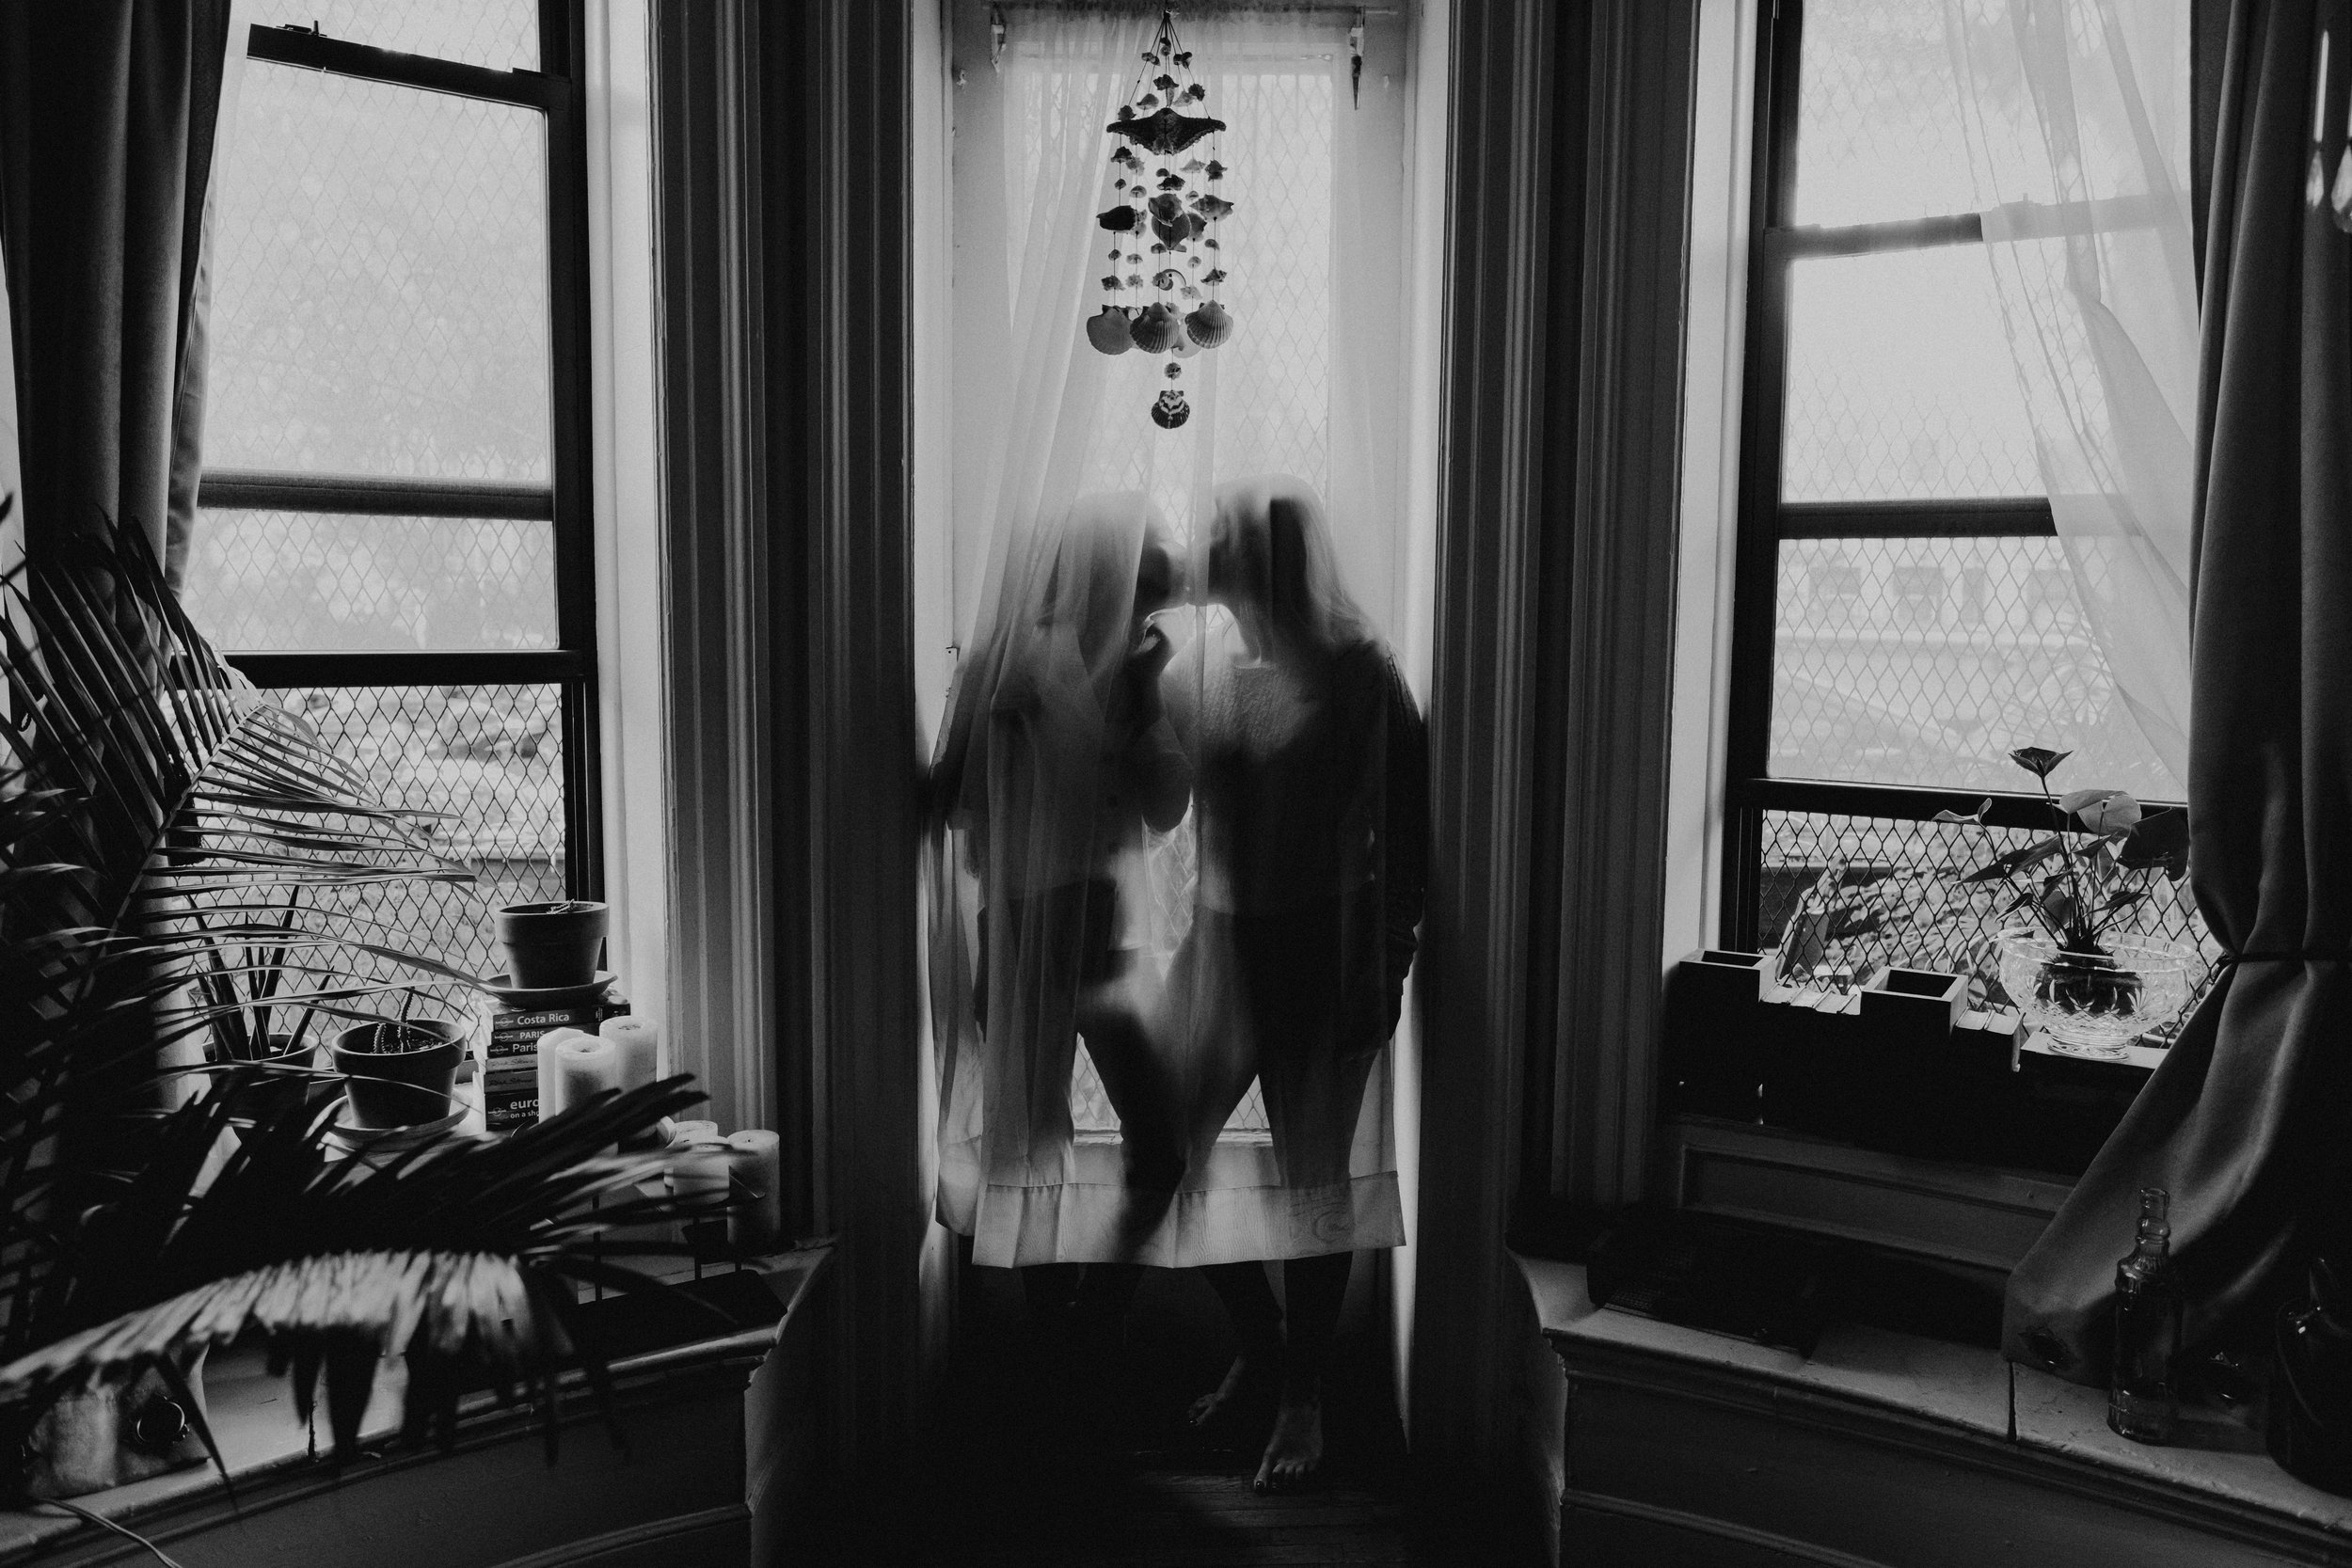 CHELLISE_MICHAEL_PHOTOGRAPHY_BEDSTUY_PORTRAITS-3076.jpg